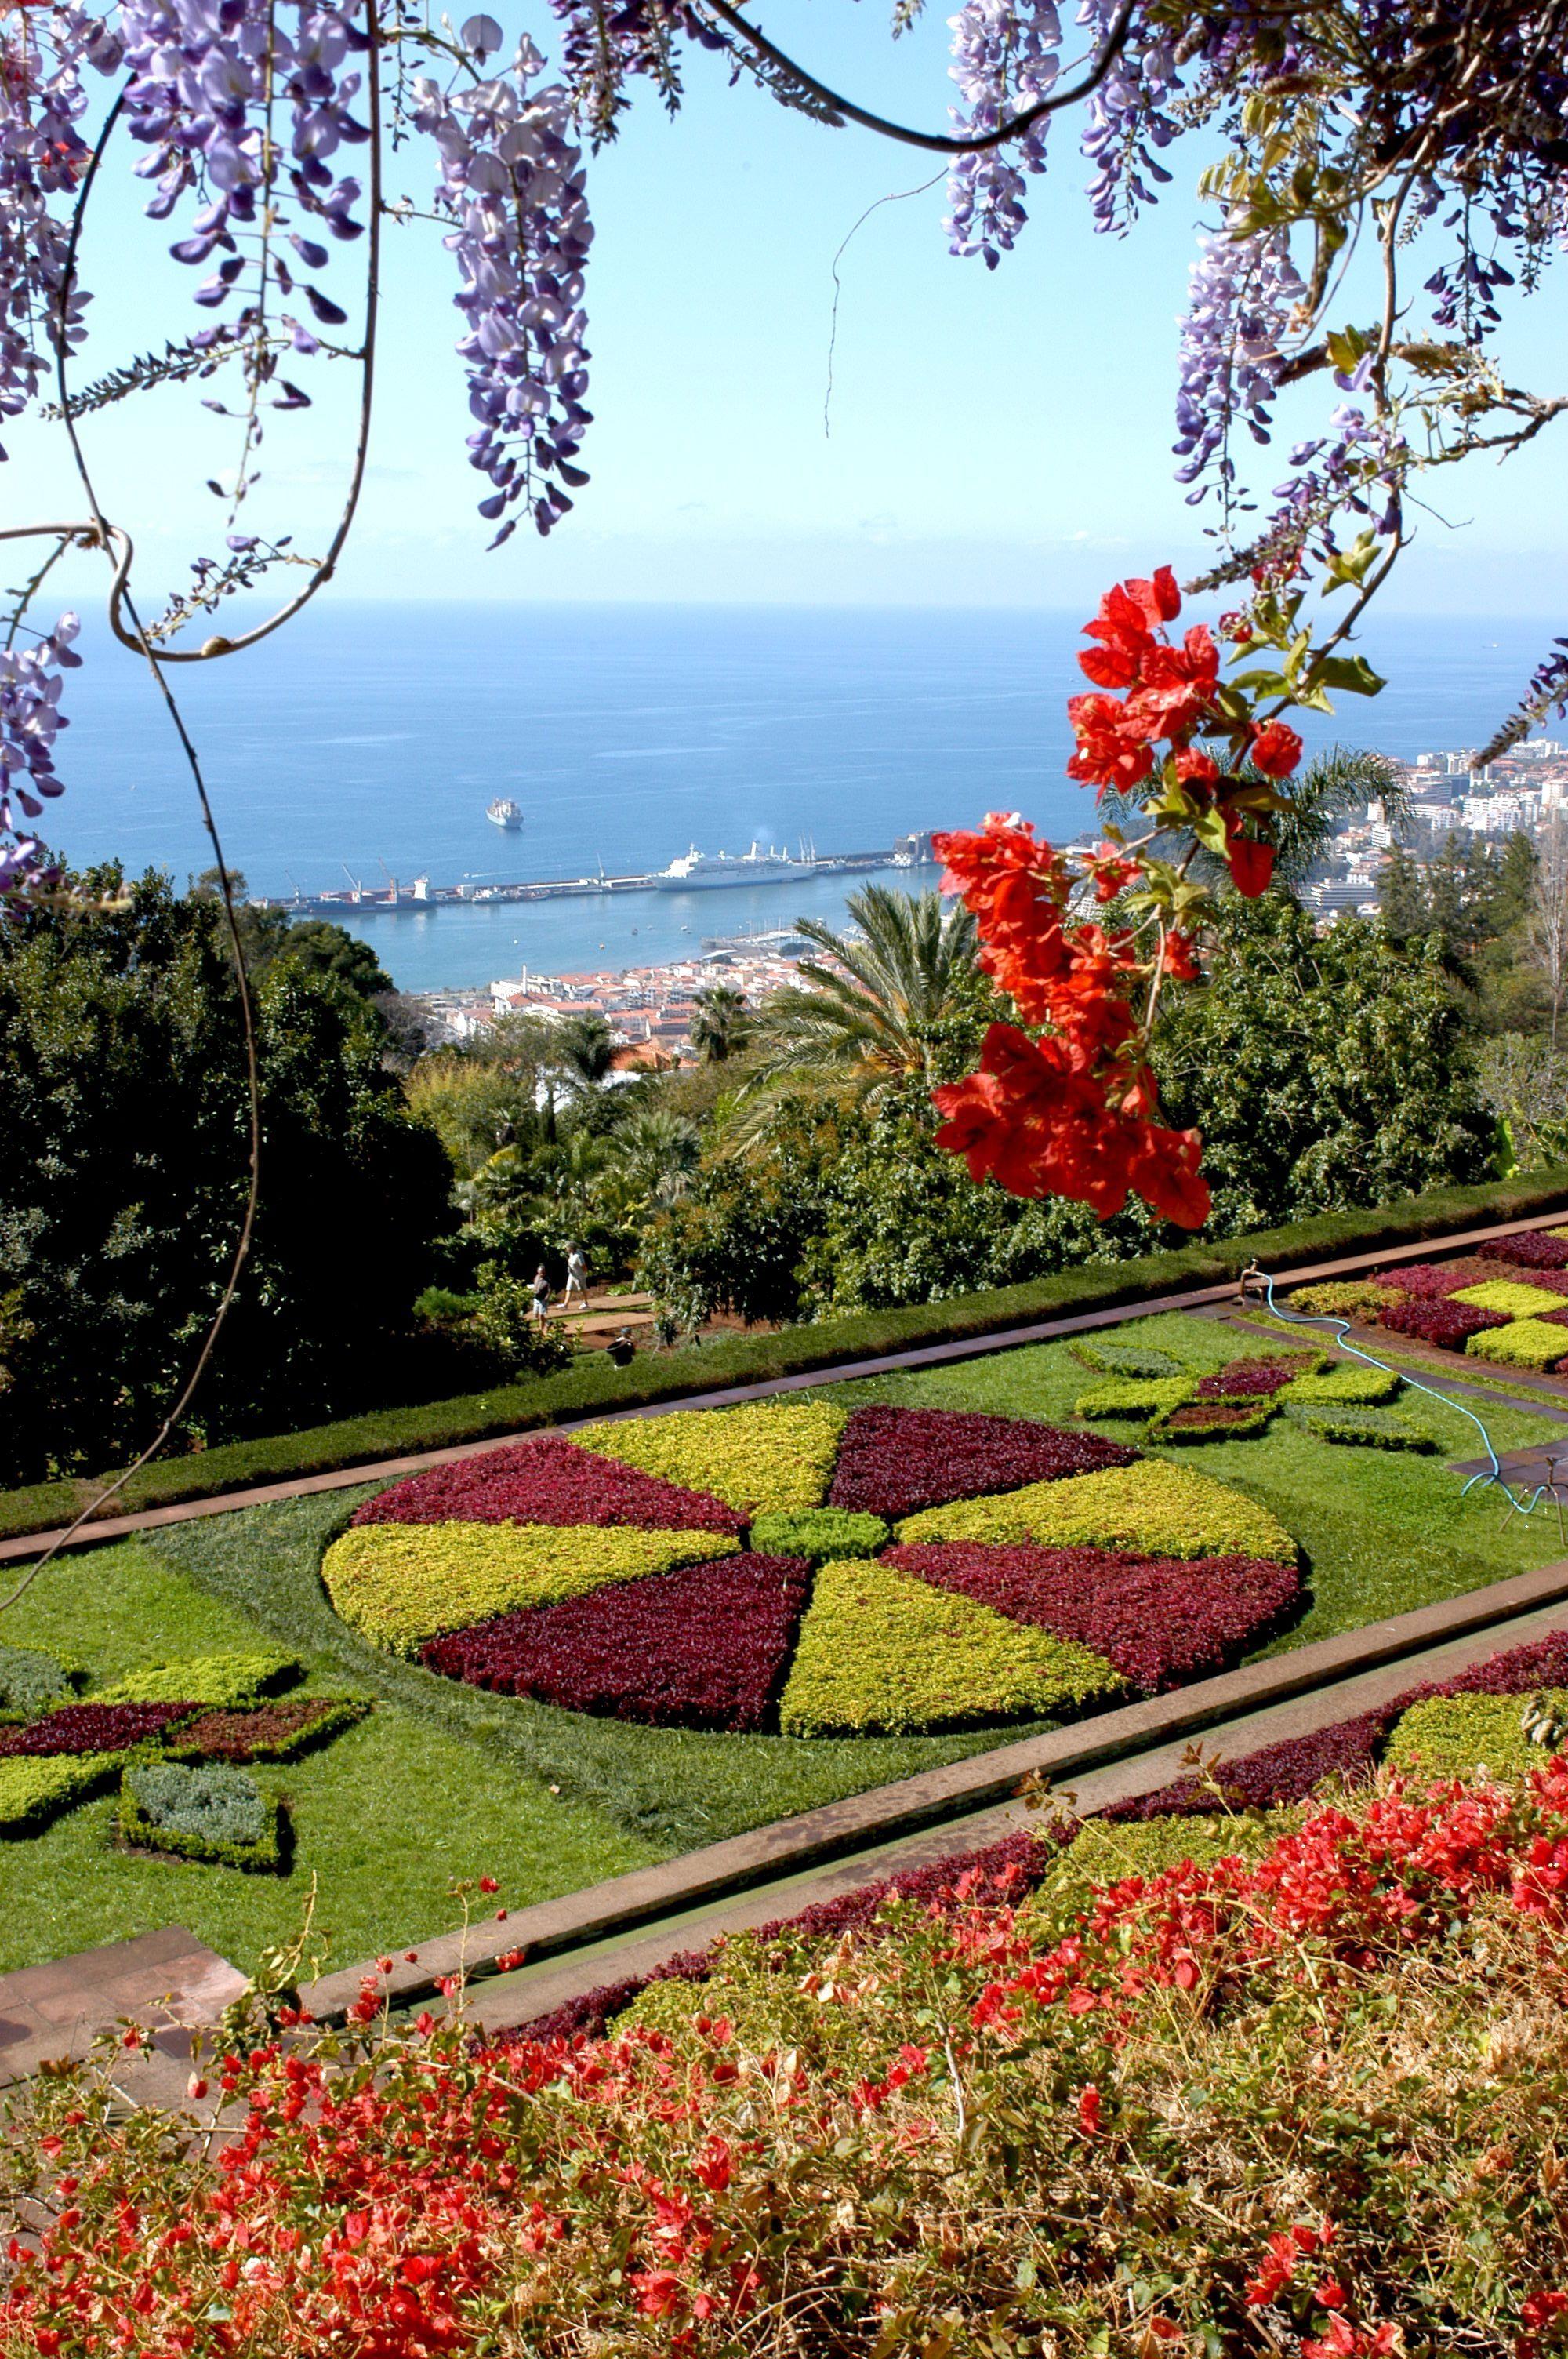 Funchal Botanic Garden Madeira Island Portugal Where I Want To Be